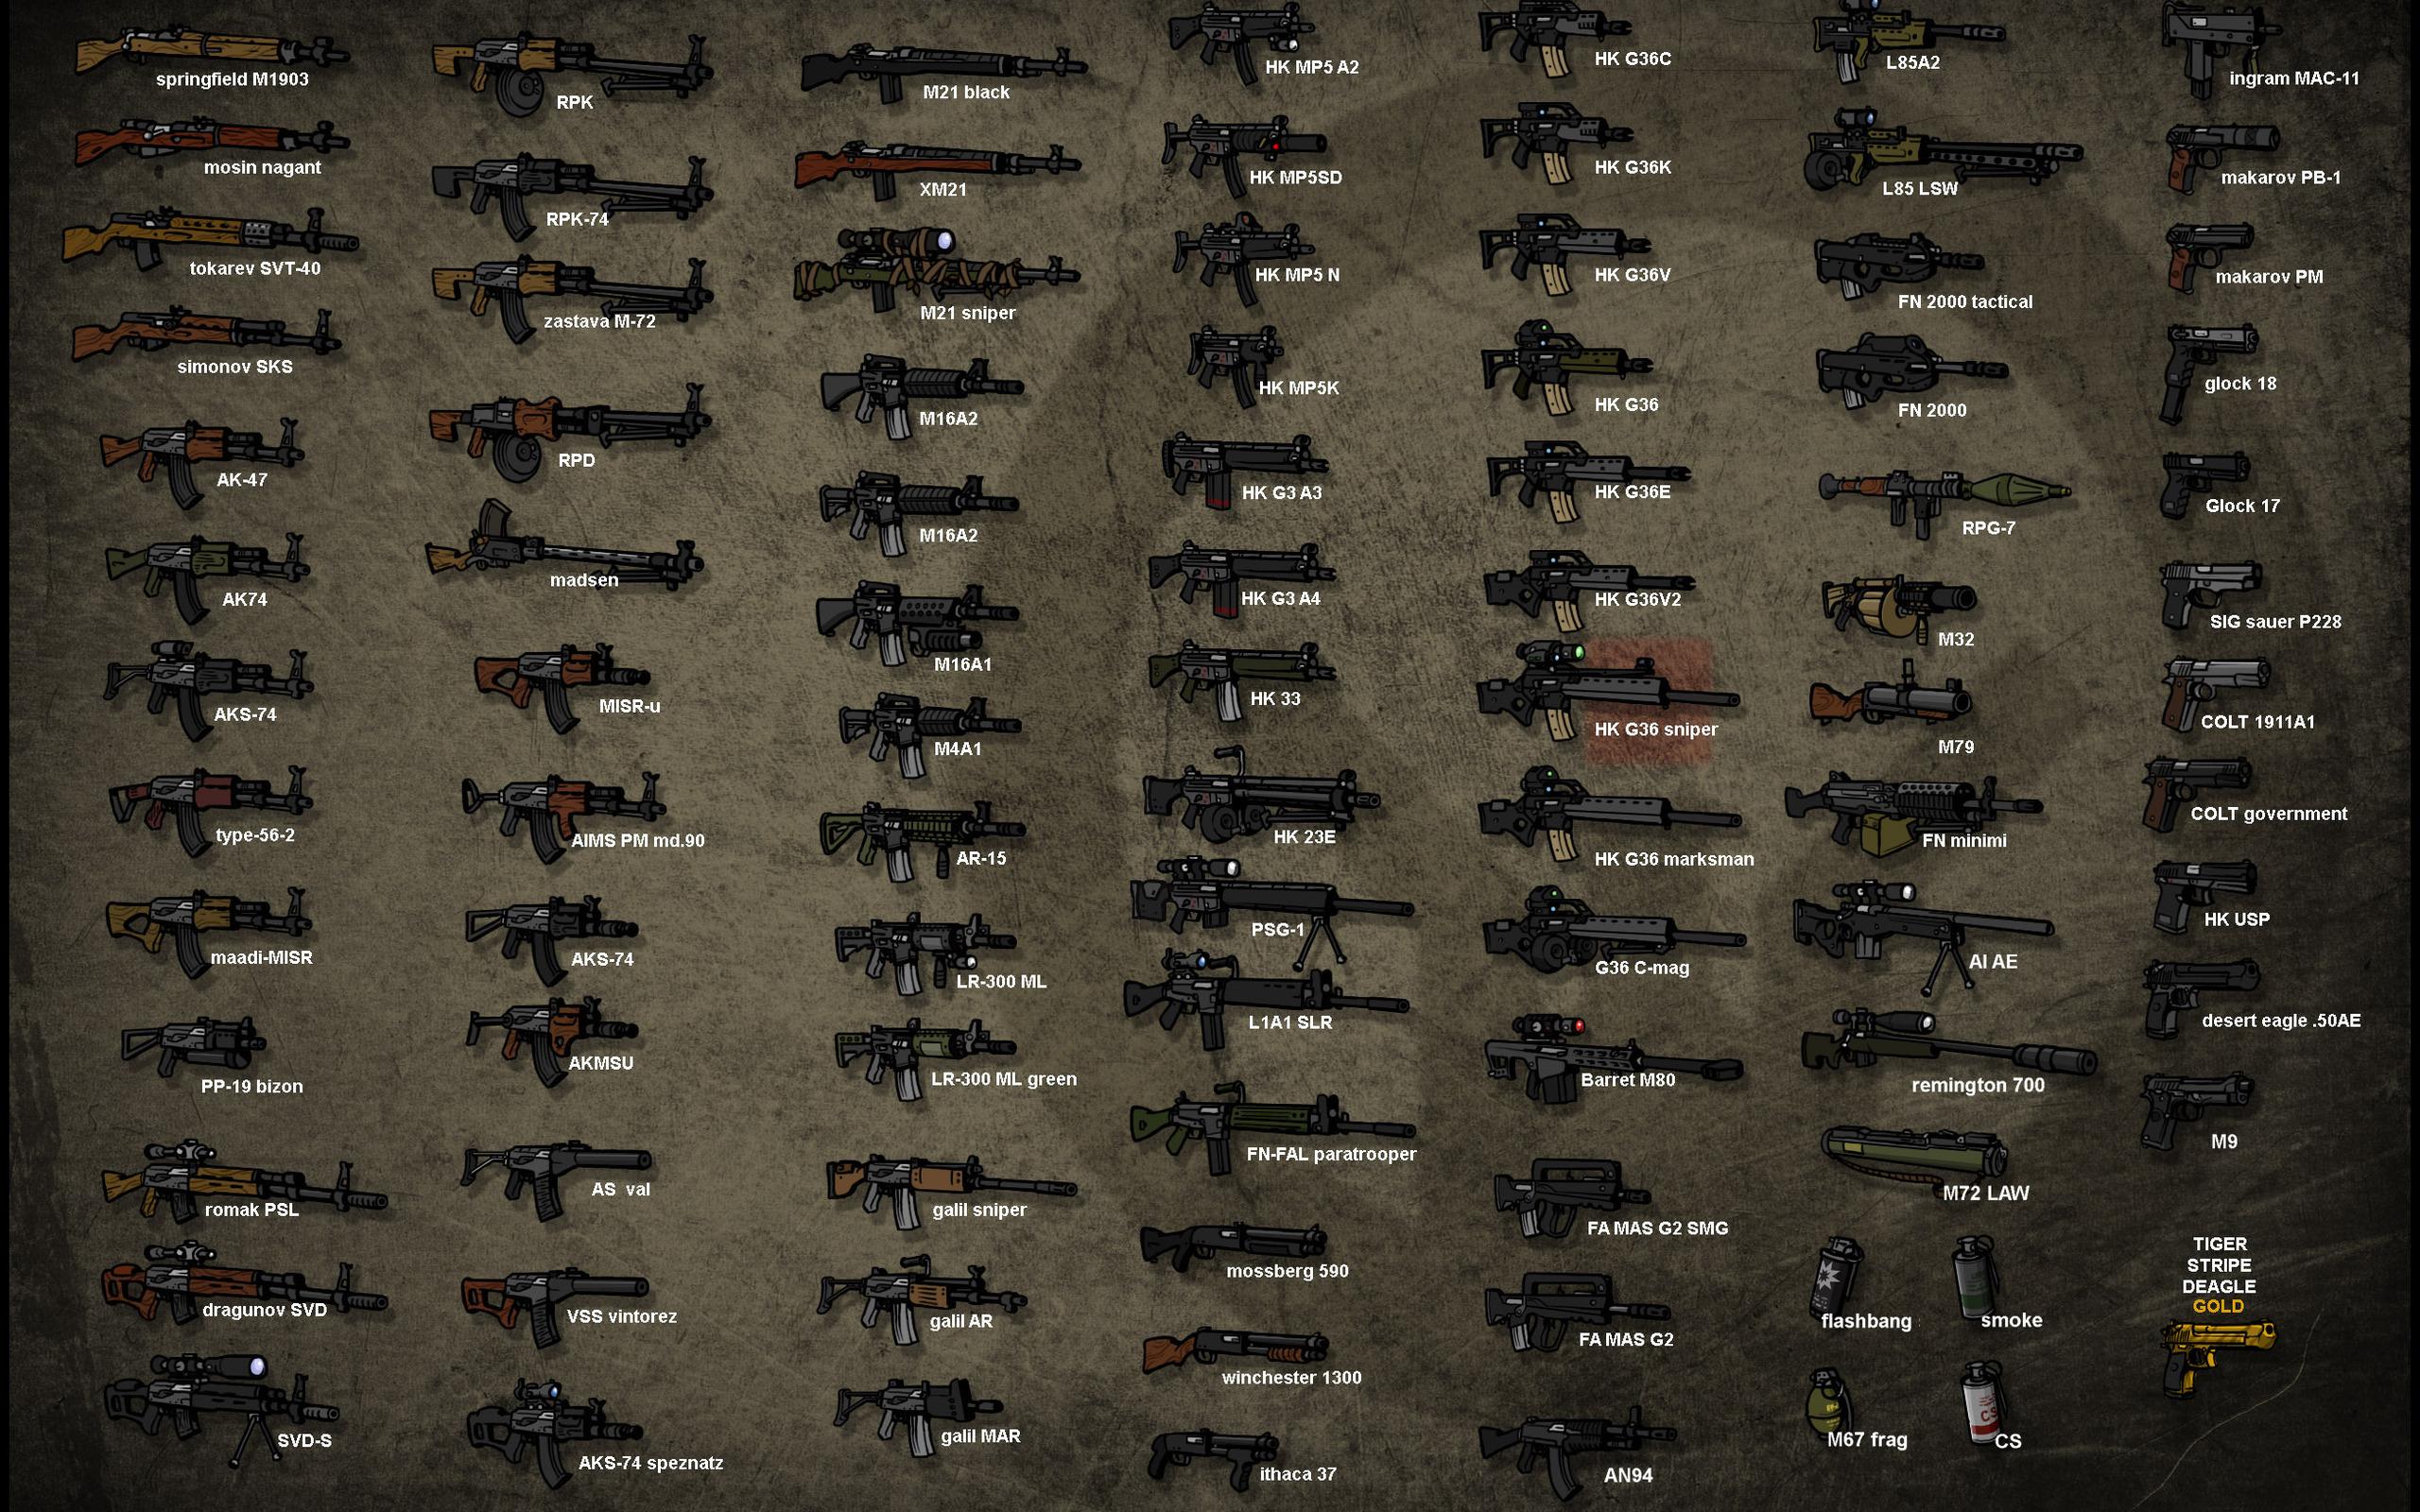 Assault Rifle HD Wallpaper Background Image 2560x1600 ID 2560x1600